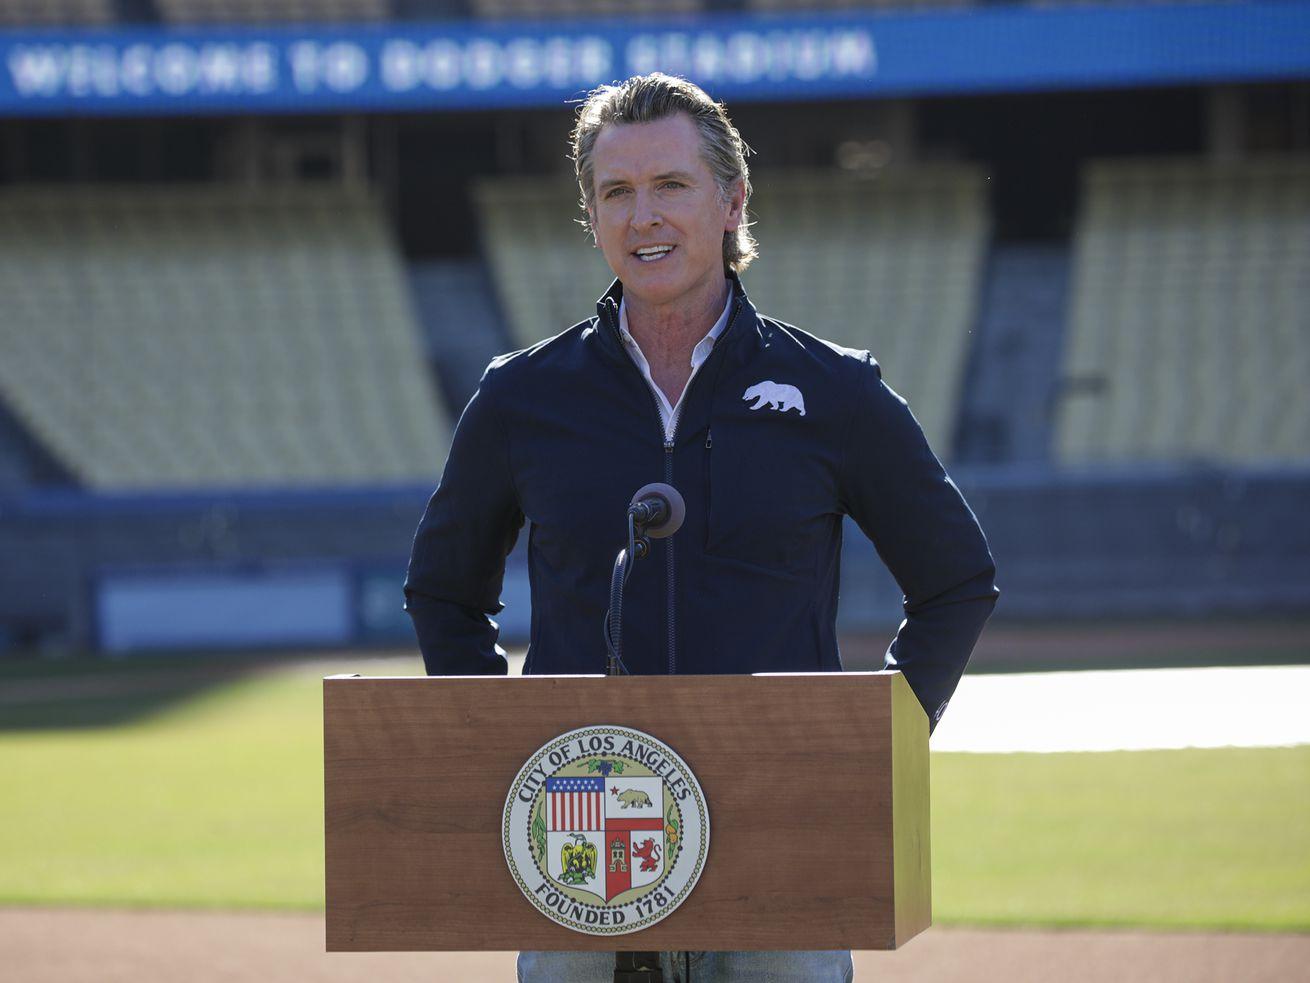 Gavin Newsom stands at a podium in Dodger Stadium.